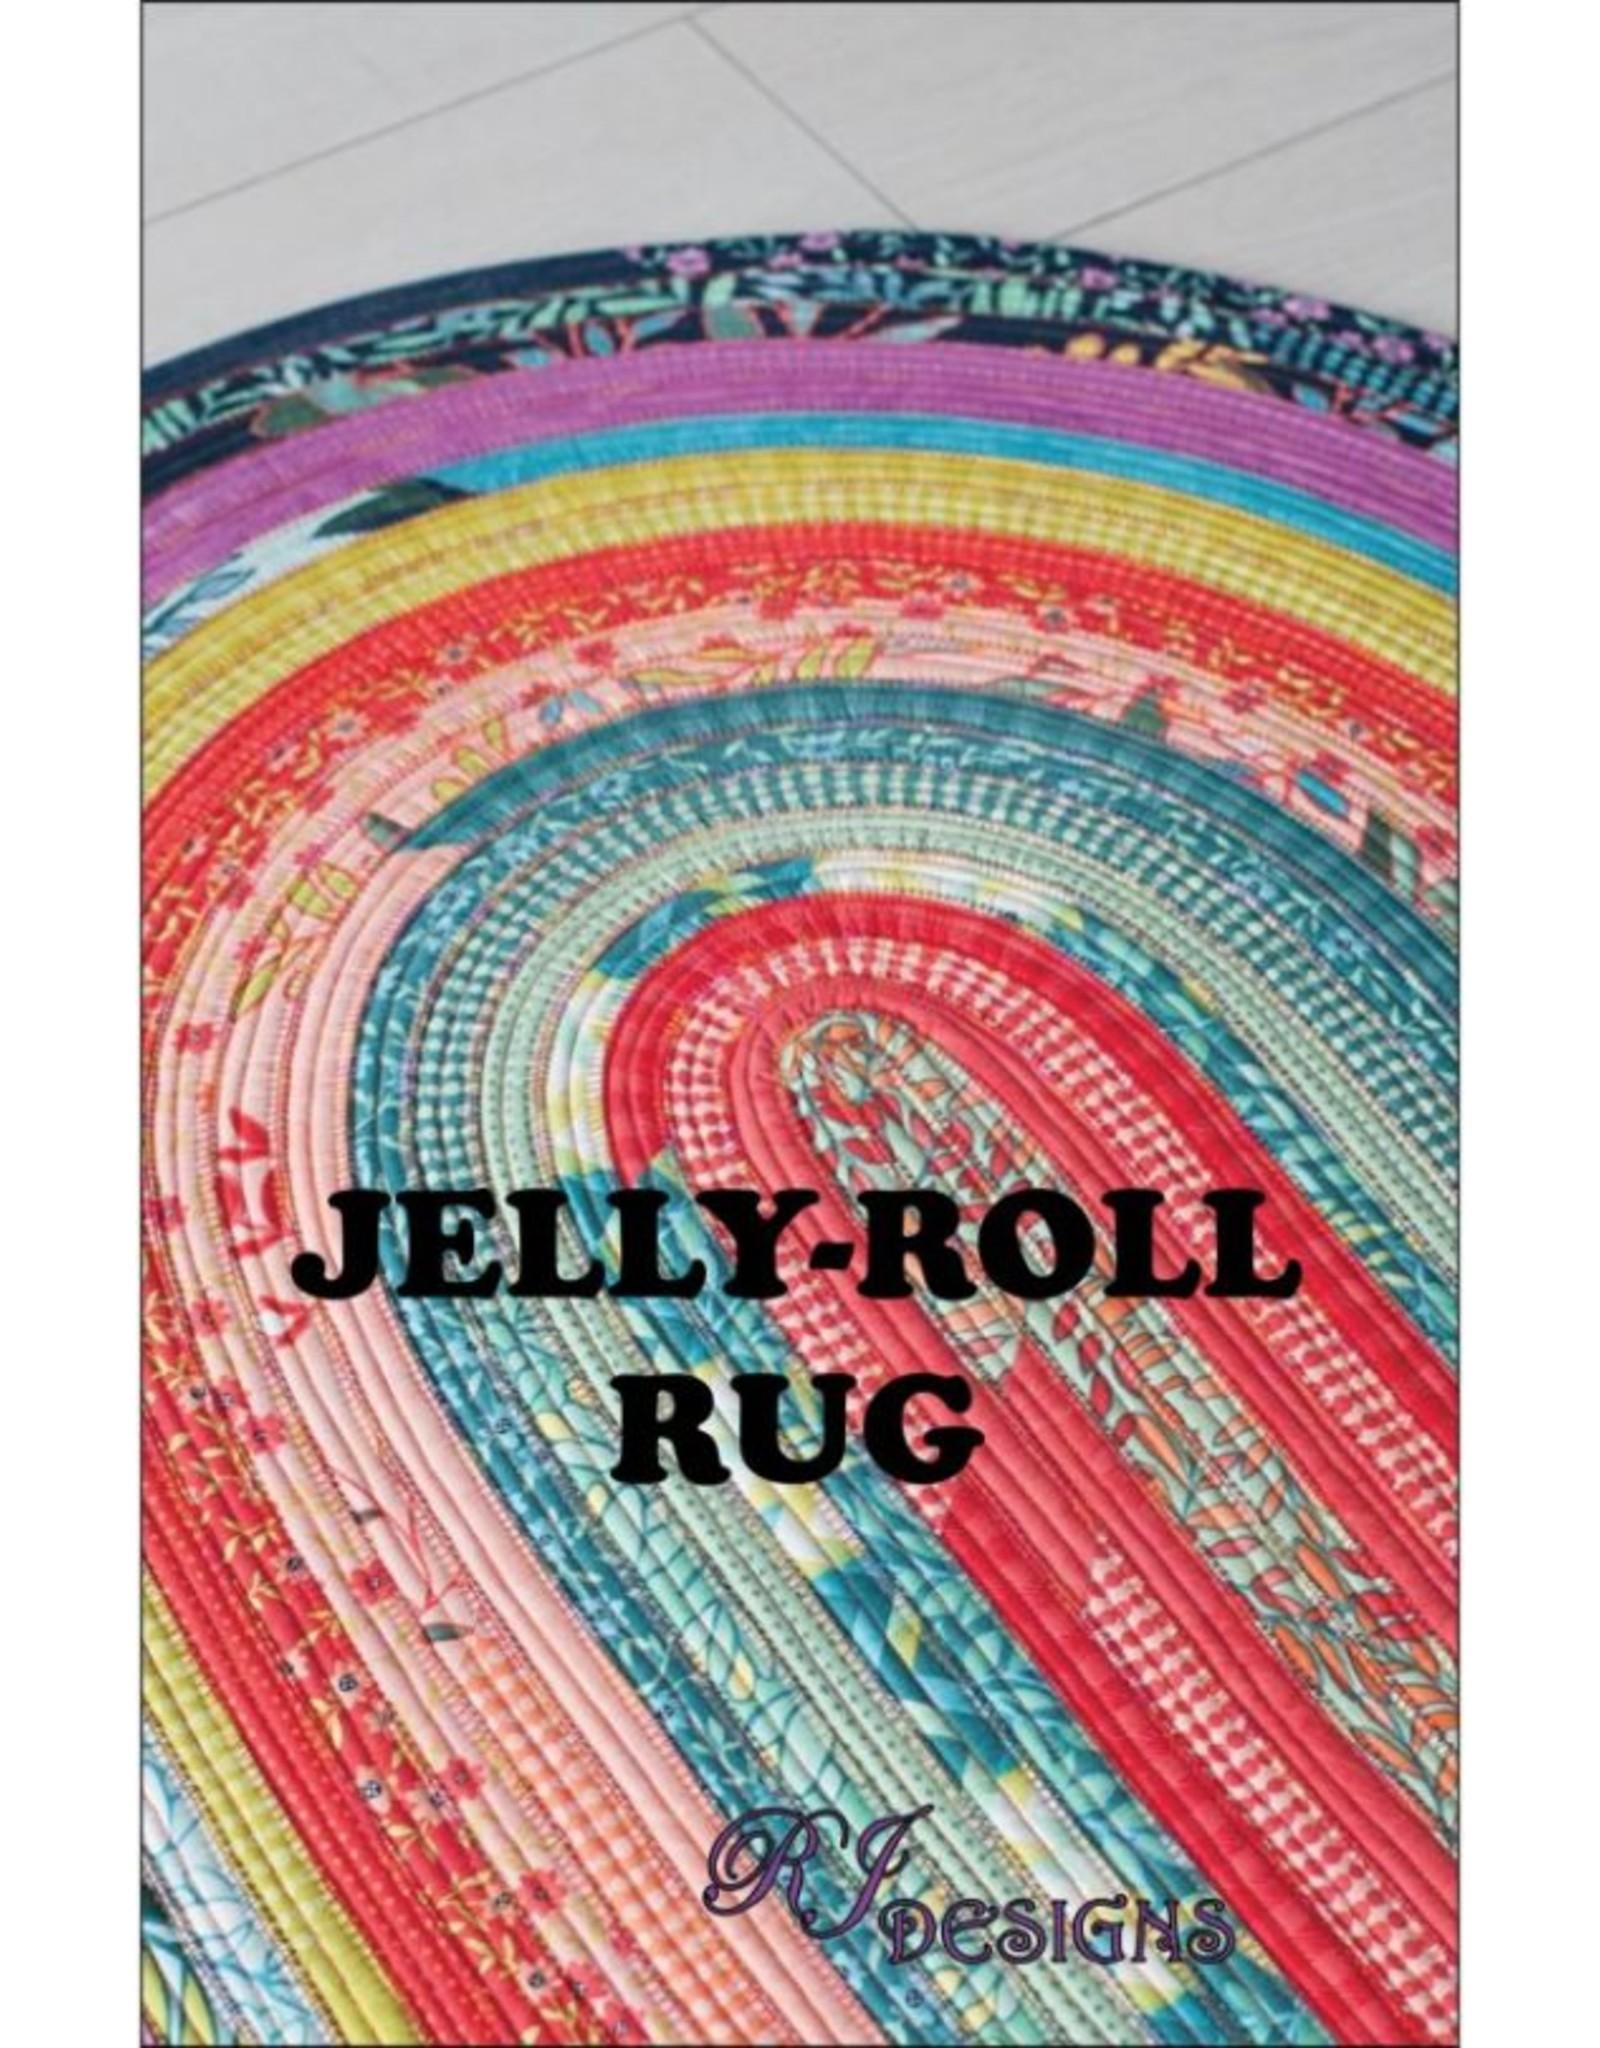 Diversen Jelly-Roll Rug